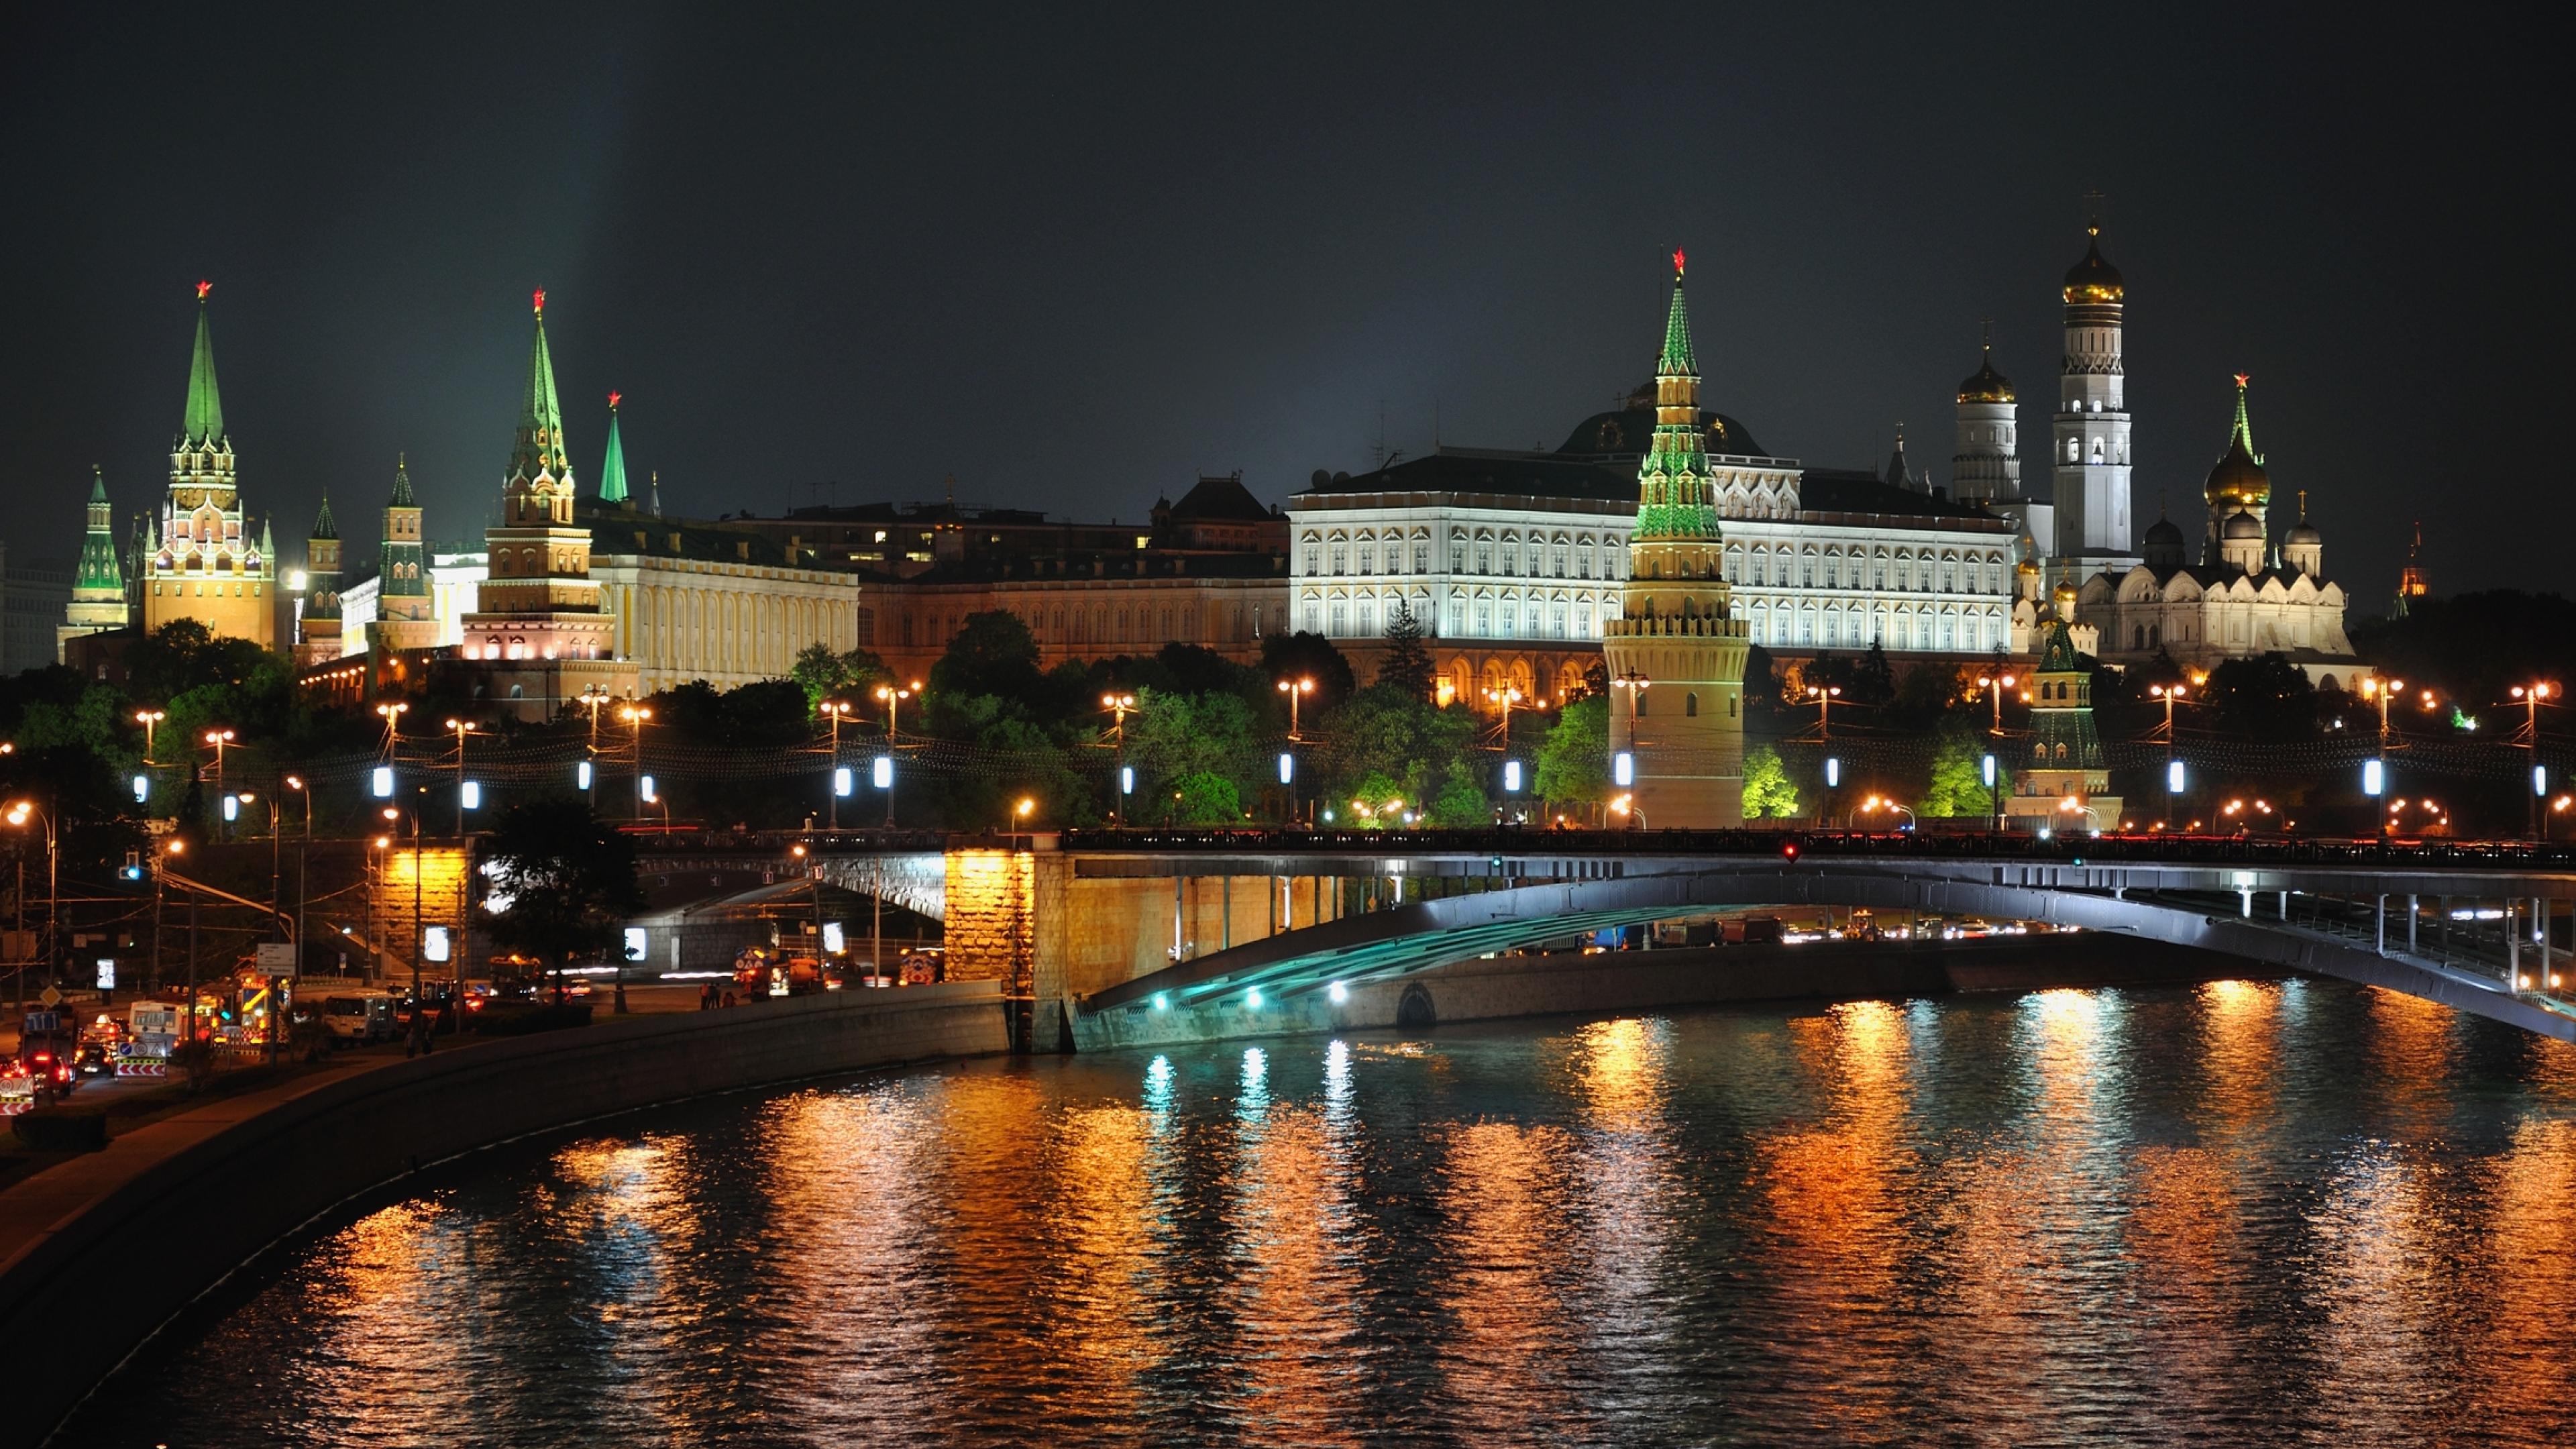 3840x2160 City Moscow Night 4k Wallpaper Hd City 4k